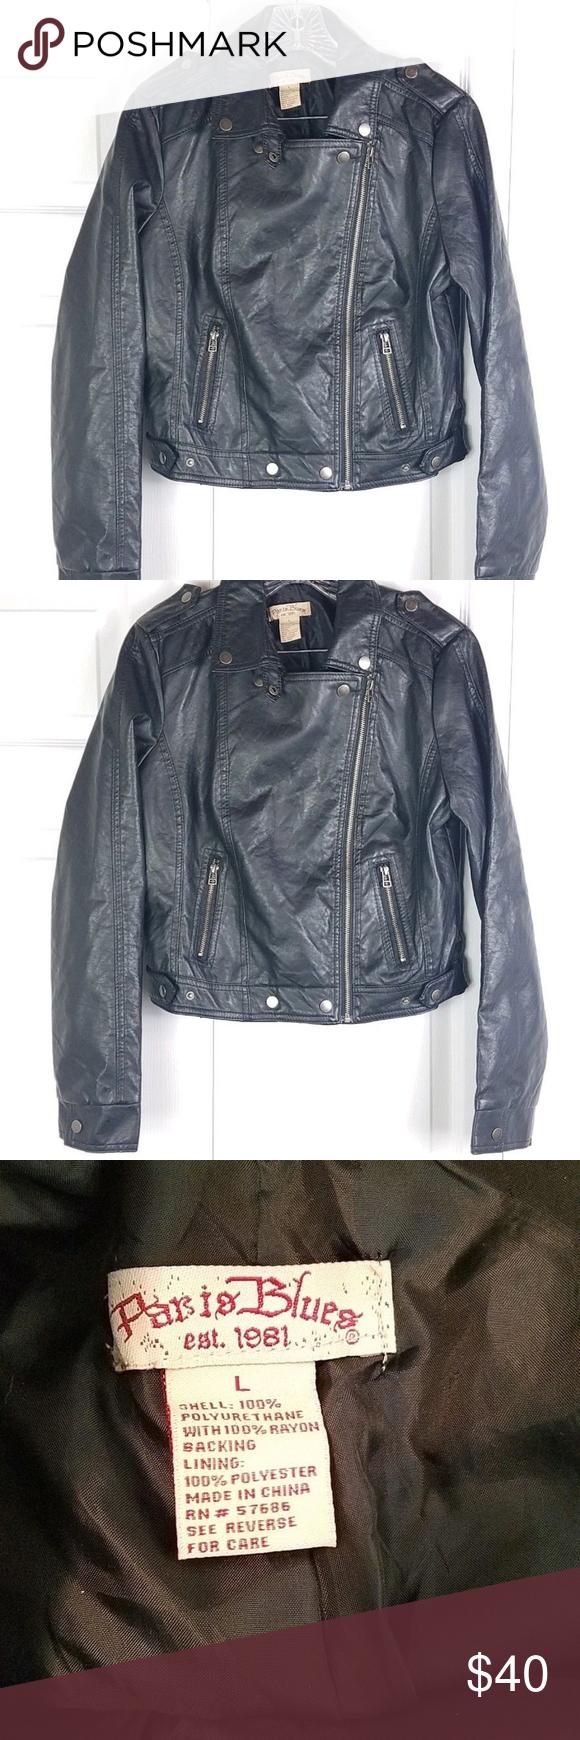 Paris Blues Black Pleather Motorcycle Jacket Paris Blues Womens Black Pleather Asymmetric Cropped Moto Jacket Size L B Jackets Cropped Moto Jacket Pleather [ 1740 x 580 Pixel ]